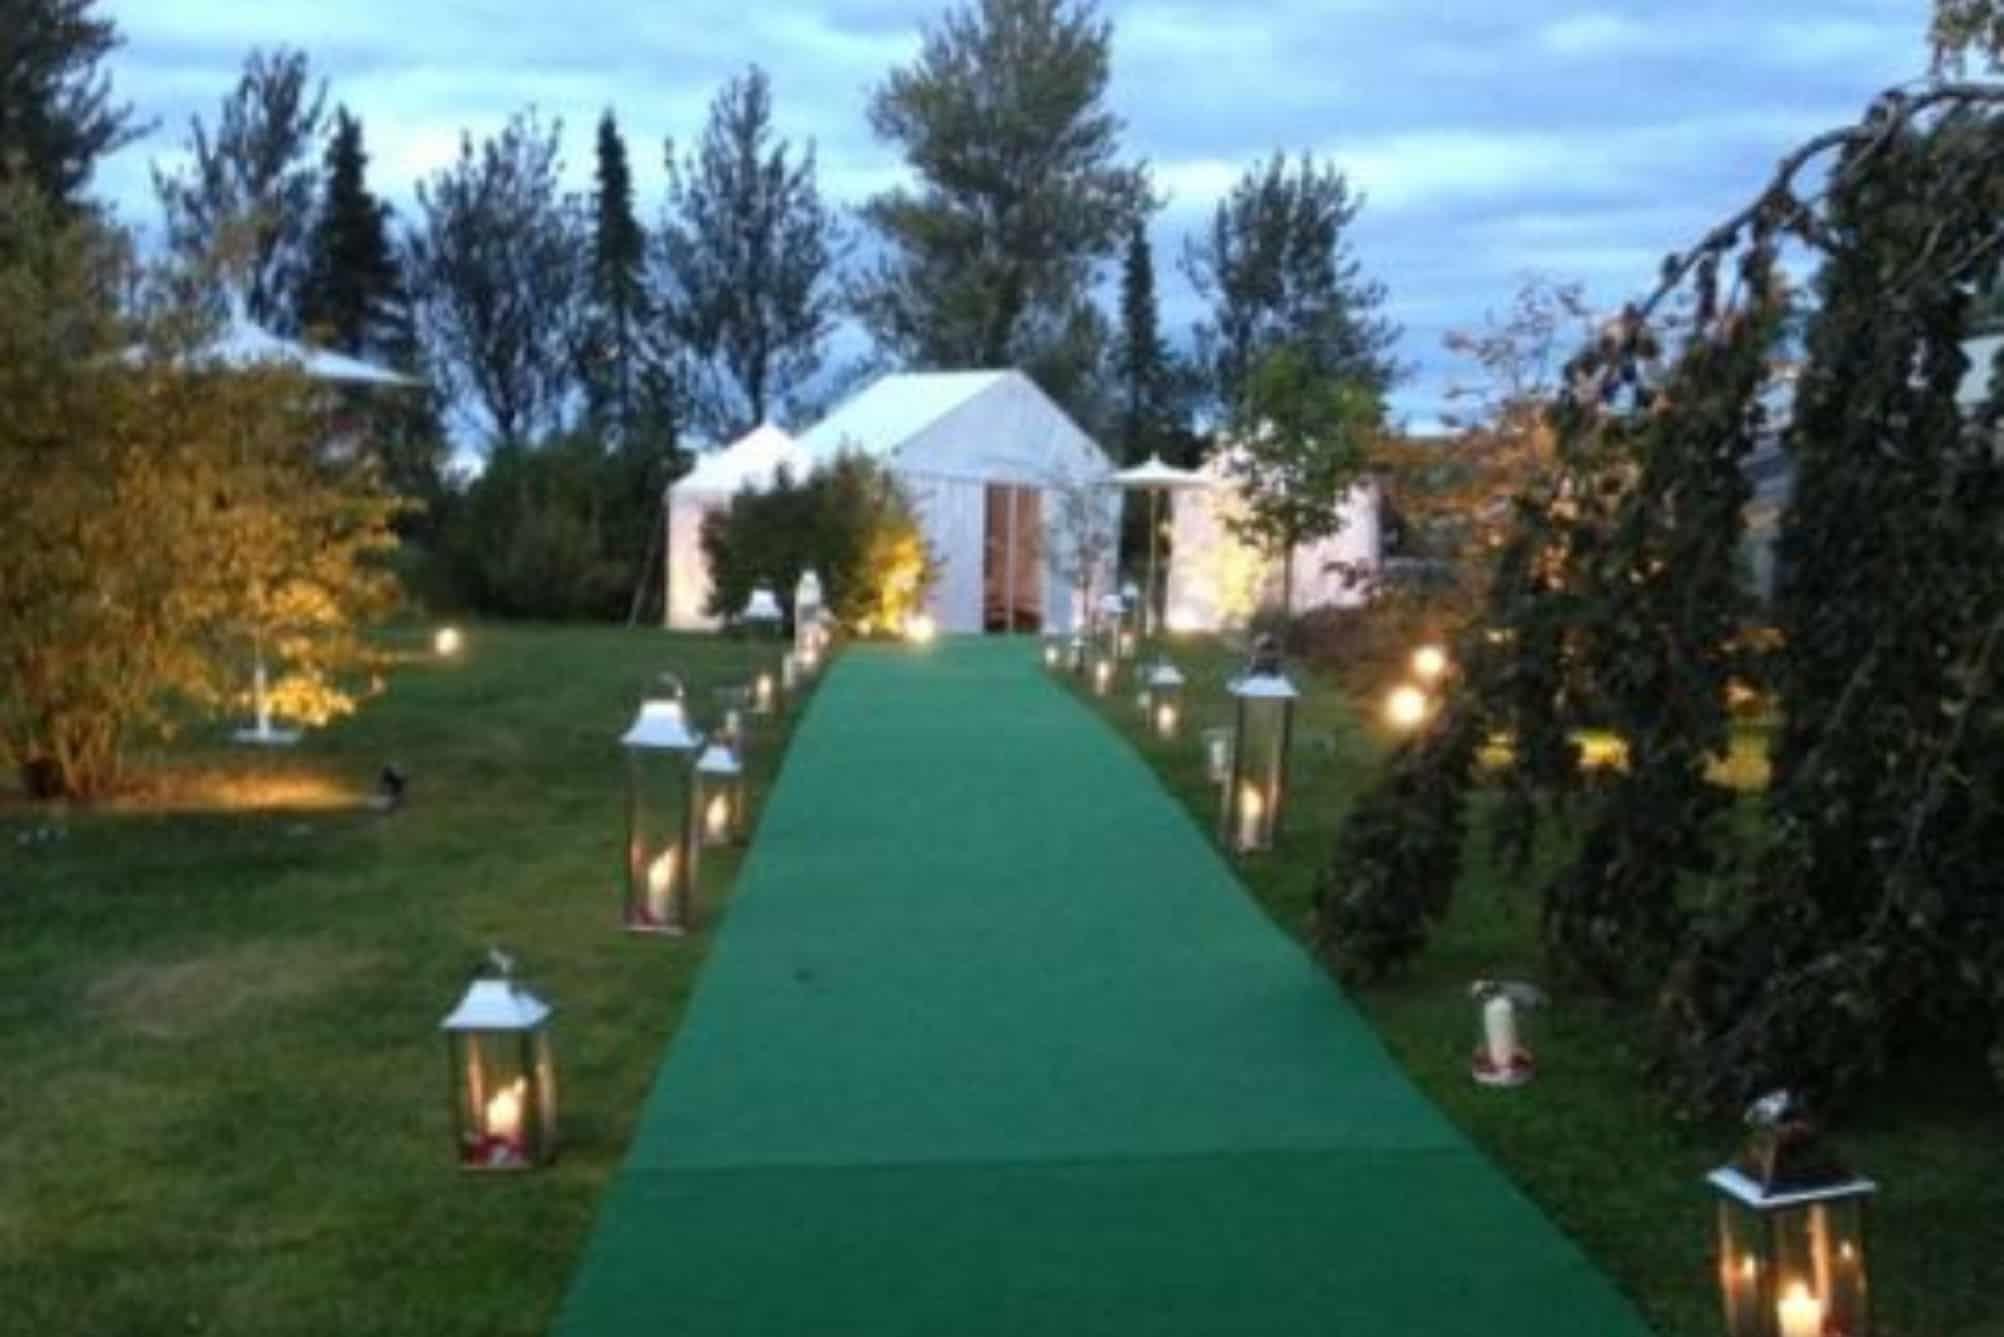 Lantern lit walk way